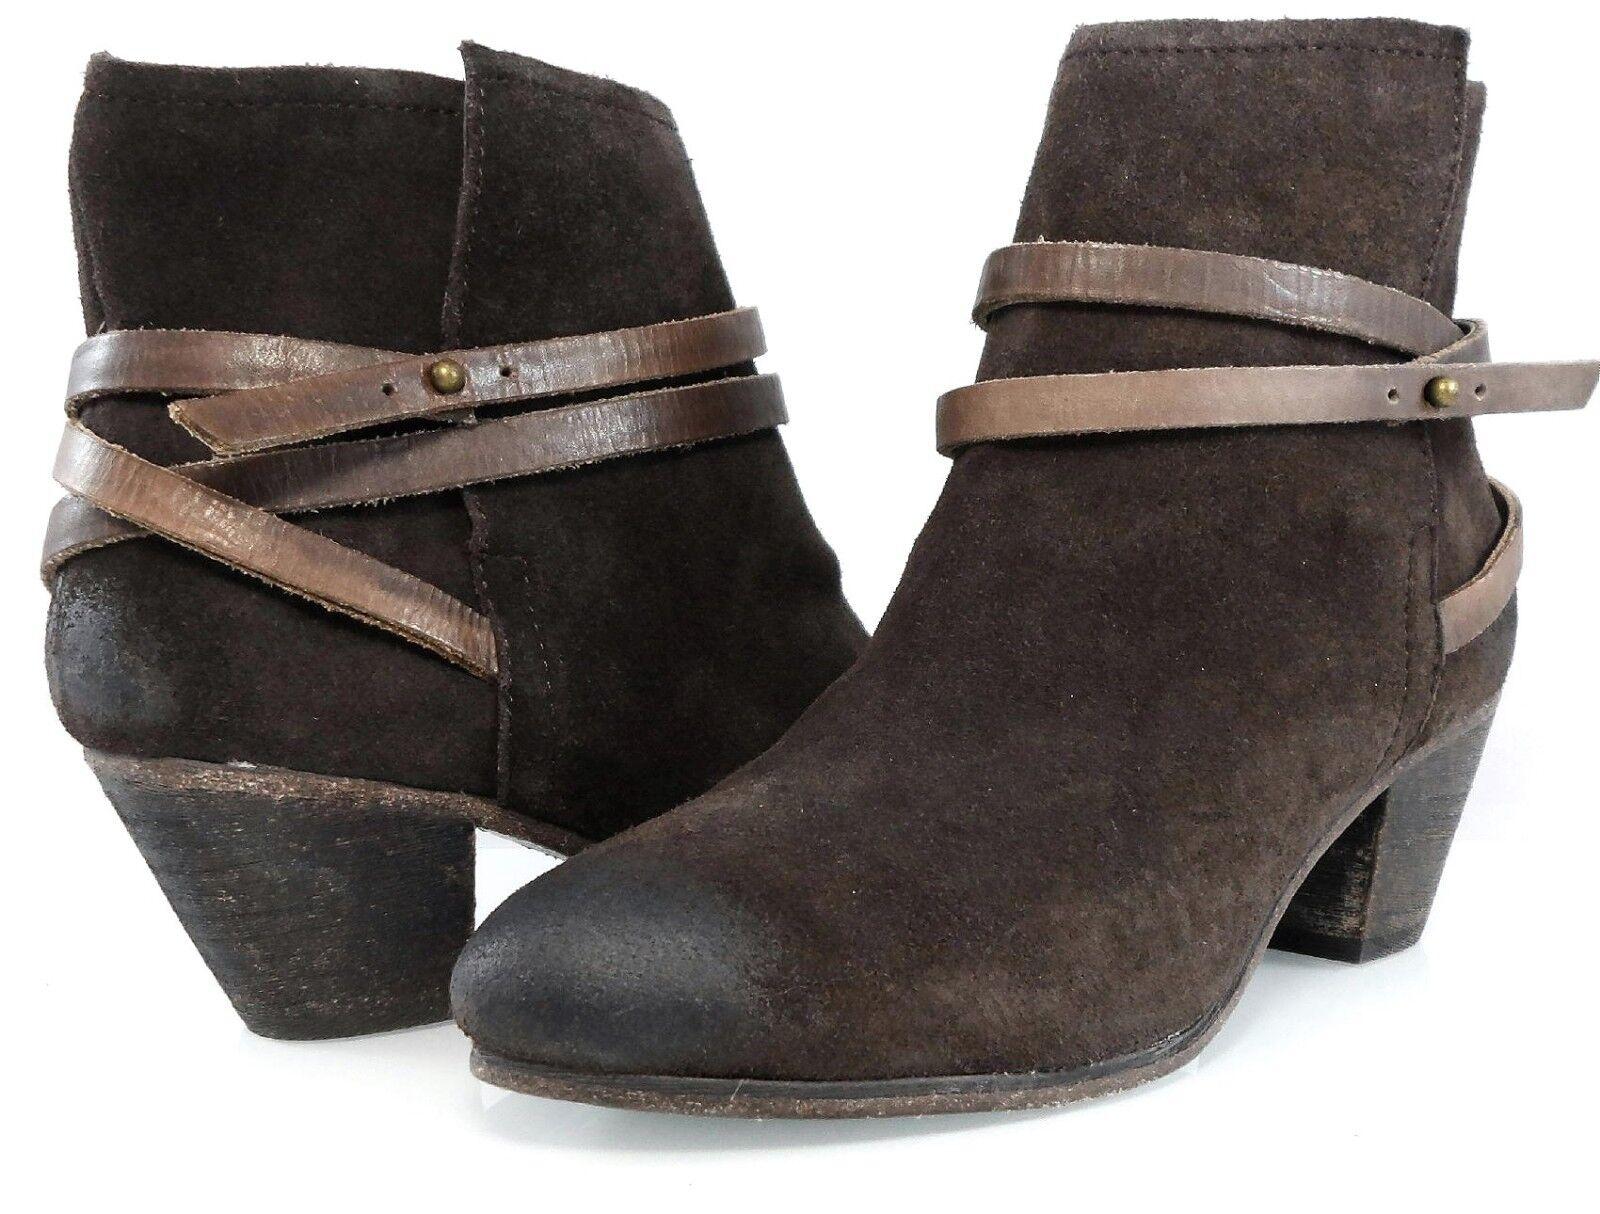 Nuevo En Caja Caja Caja  295 Ash Nikita occidental Vintage botaie Correas Tobillo botas para mujer 39 8.5 -9 71231c